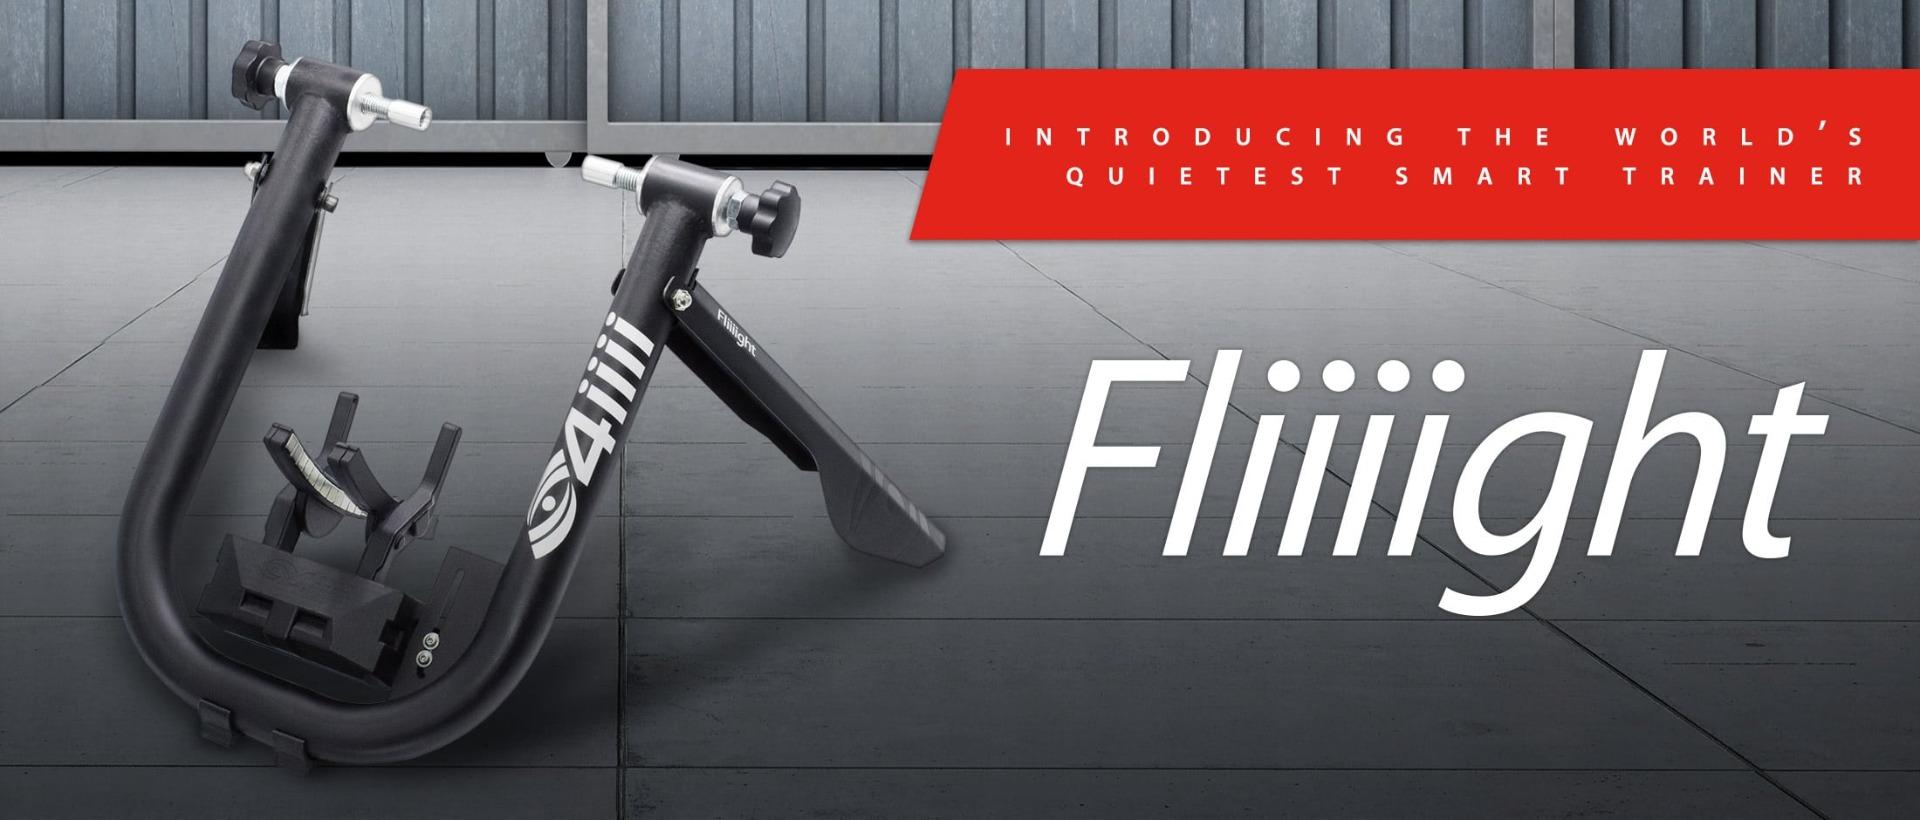 4iiii Fliiiight Smart Trainer